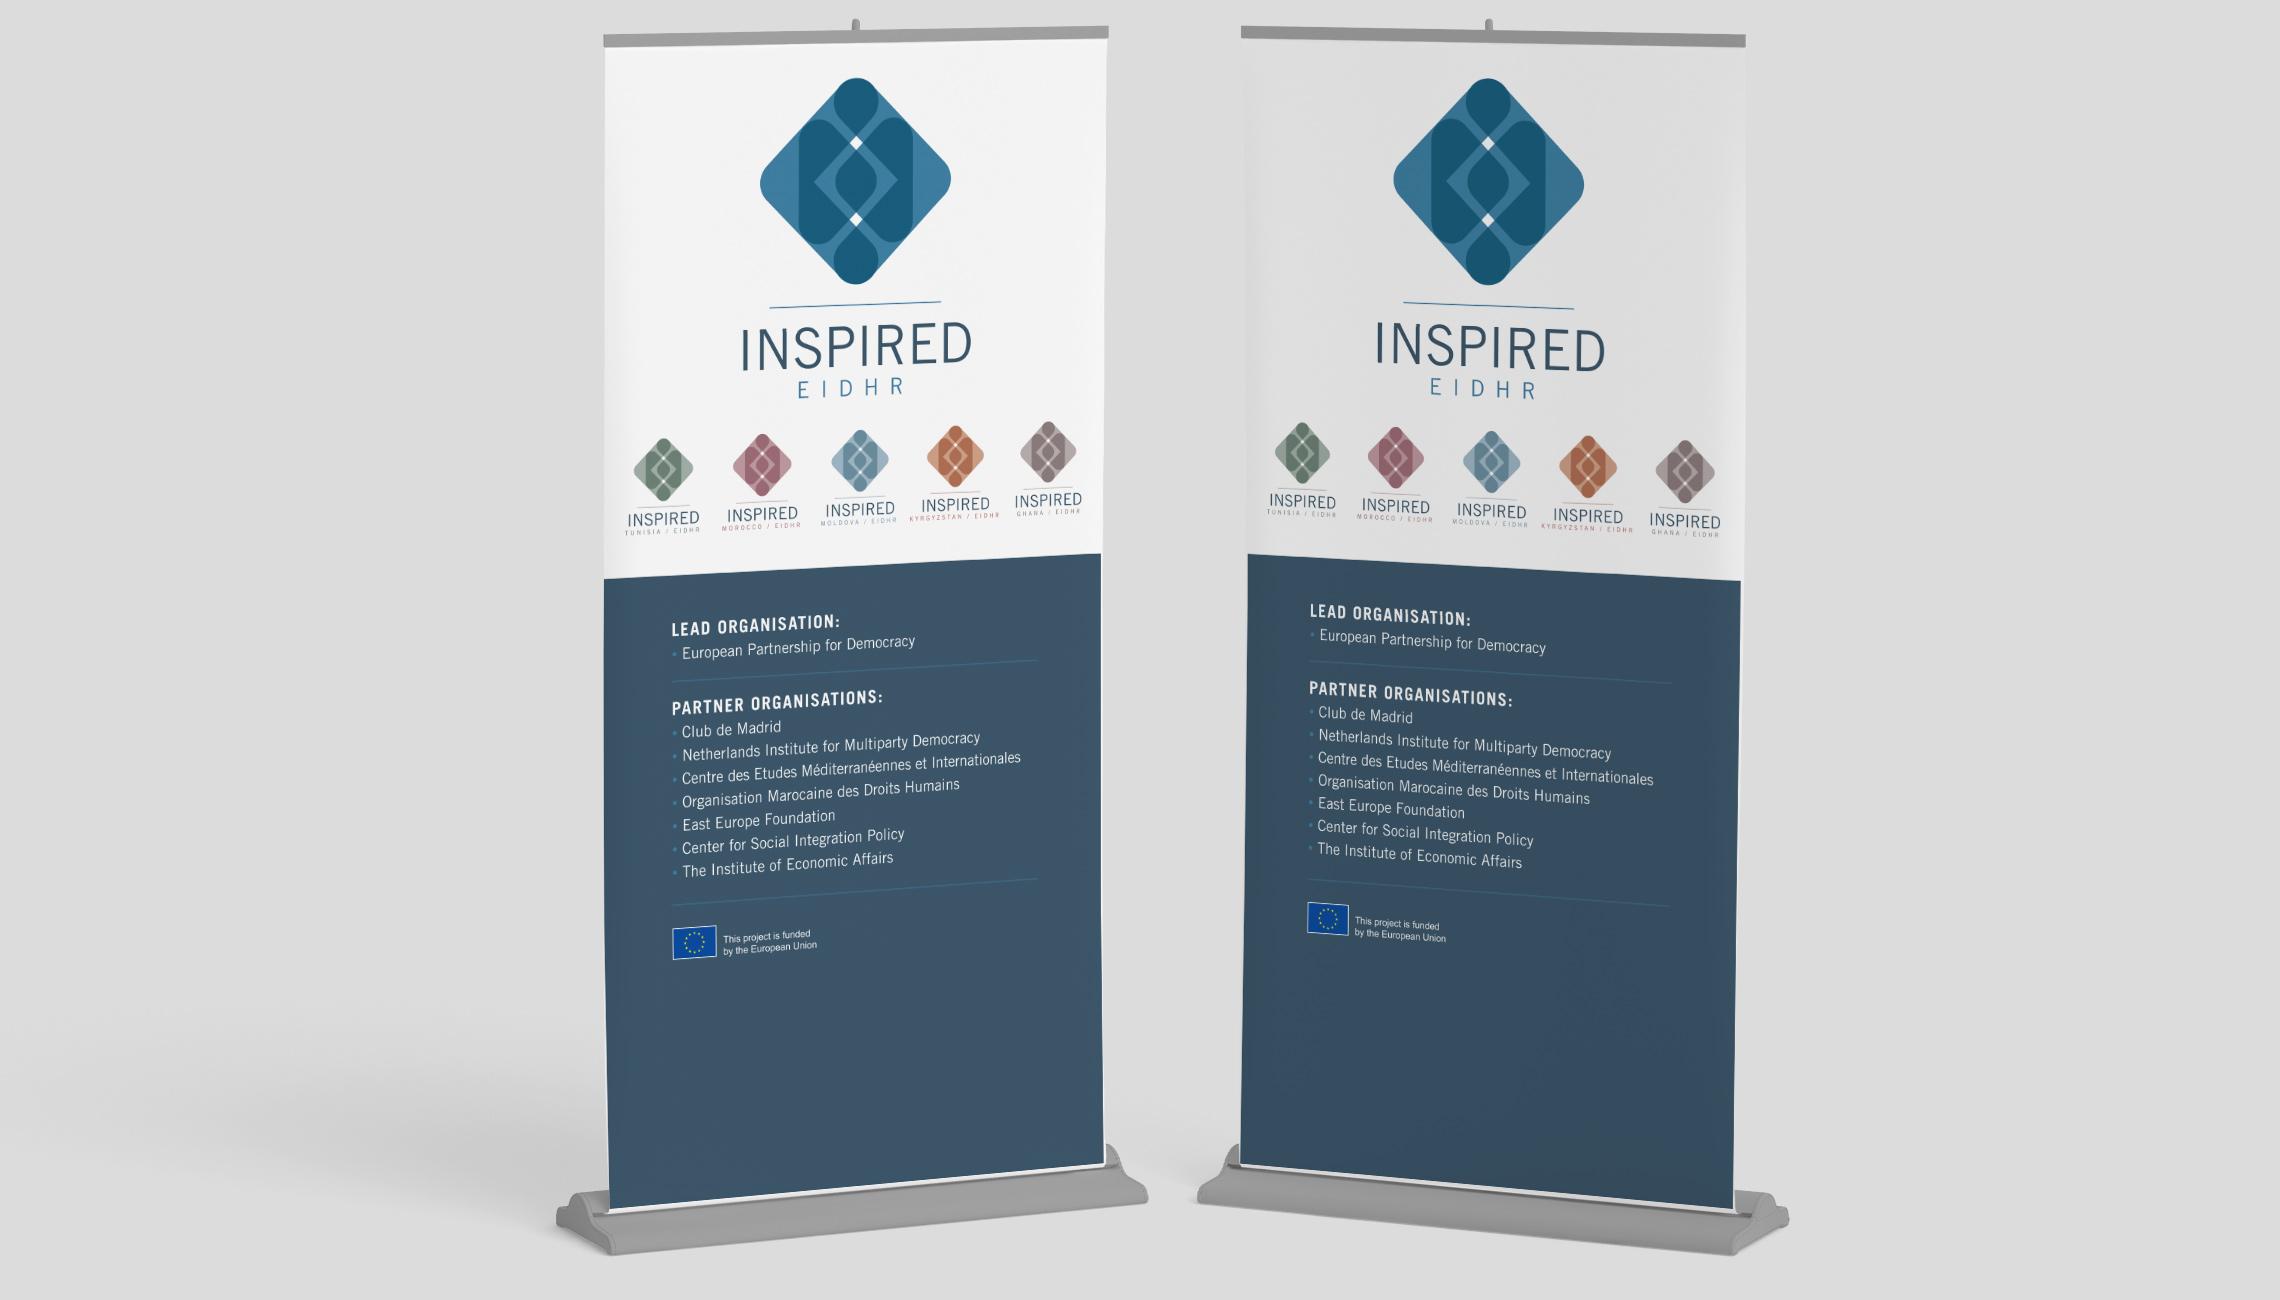 identity: INSPIRED identity design - image 3